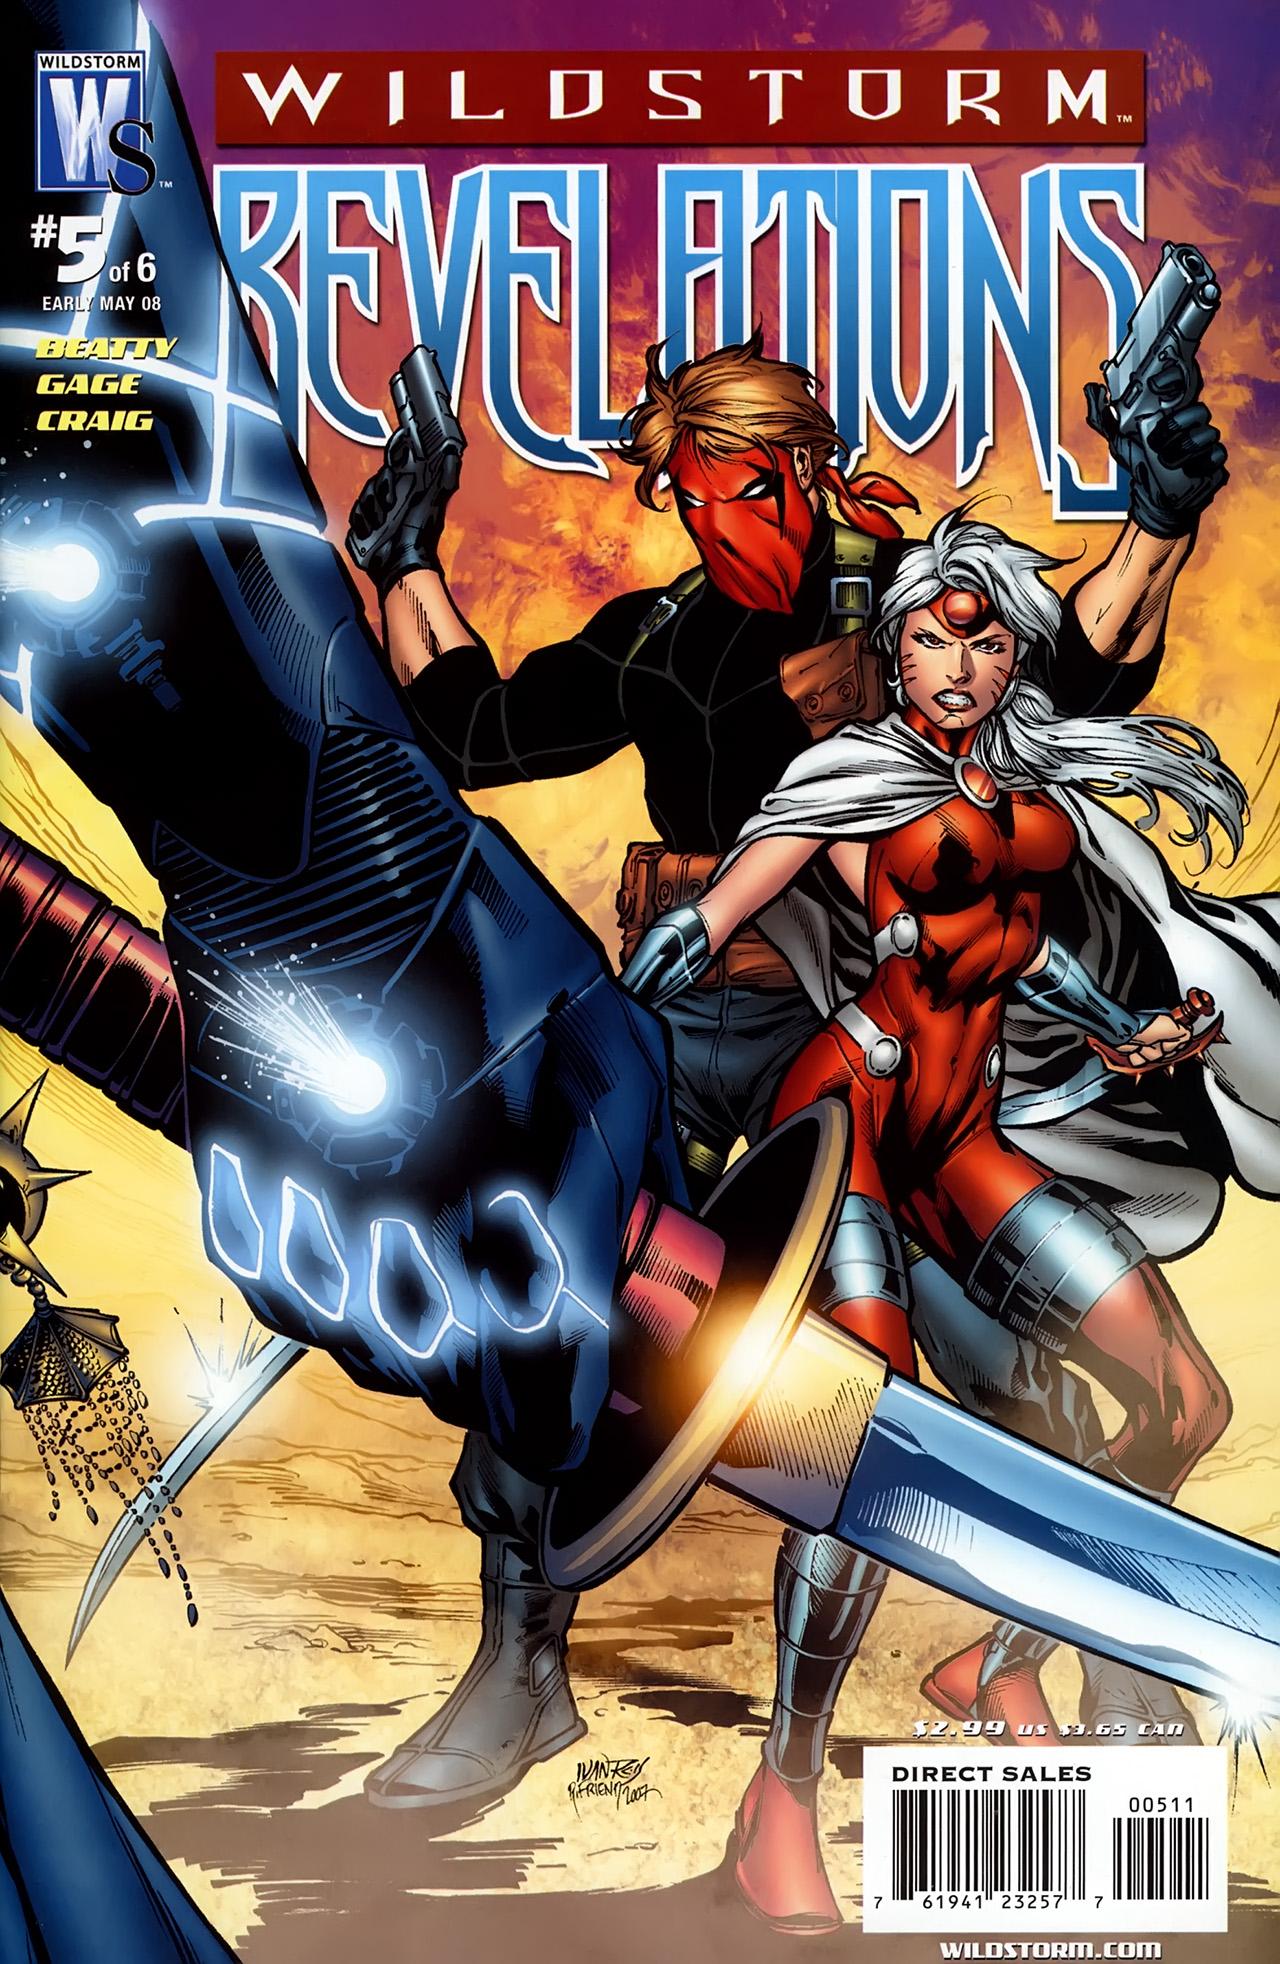 Wildstorm: Revelations Vol 1 5 | DC Database | FANDOM